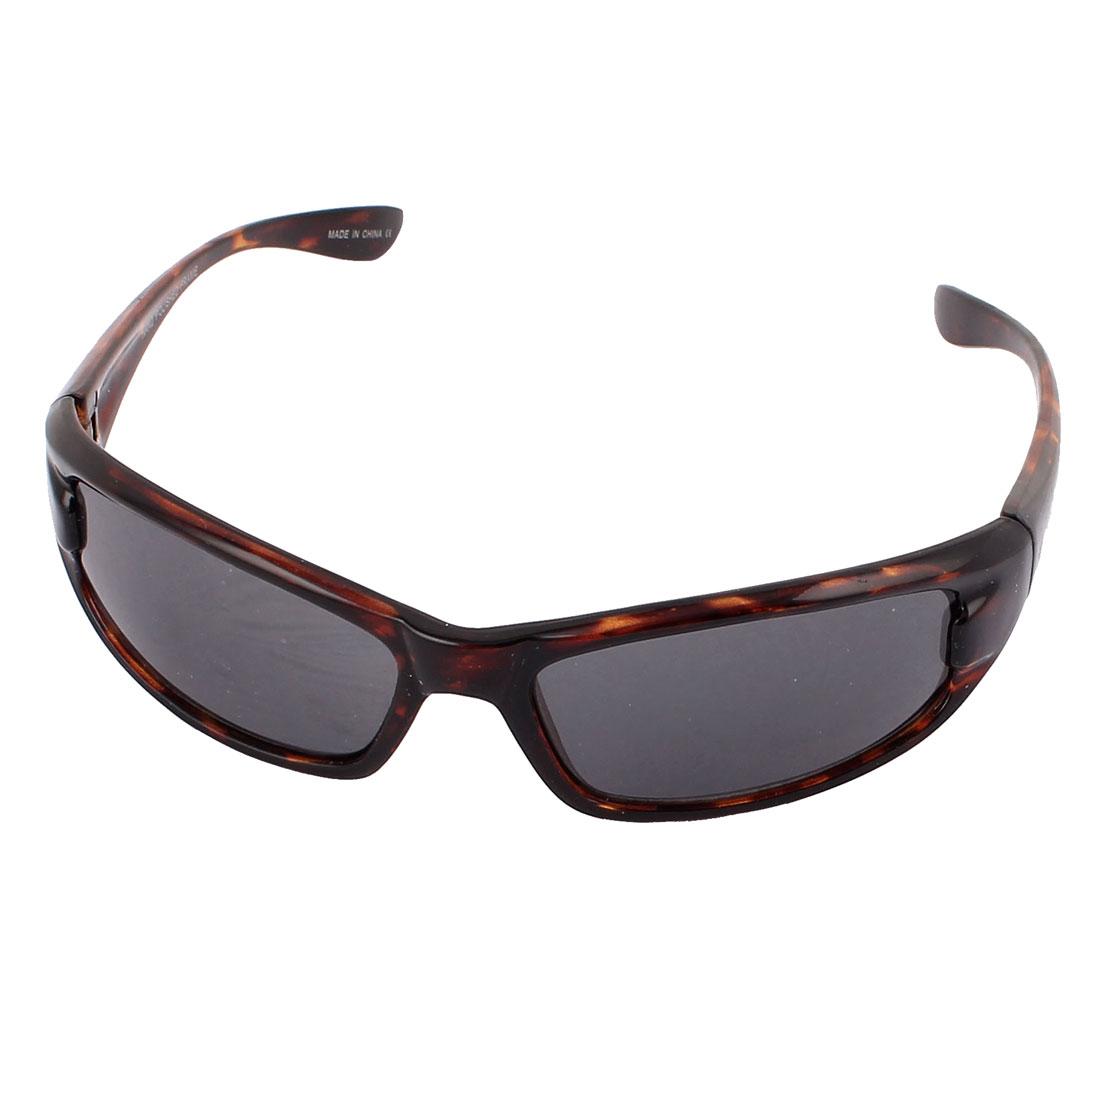 Men Retro Style Frame Outdoor Sunglasses Eyewear Glasses Dark Brown